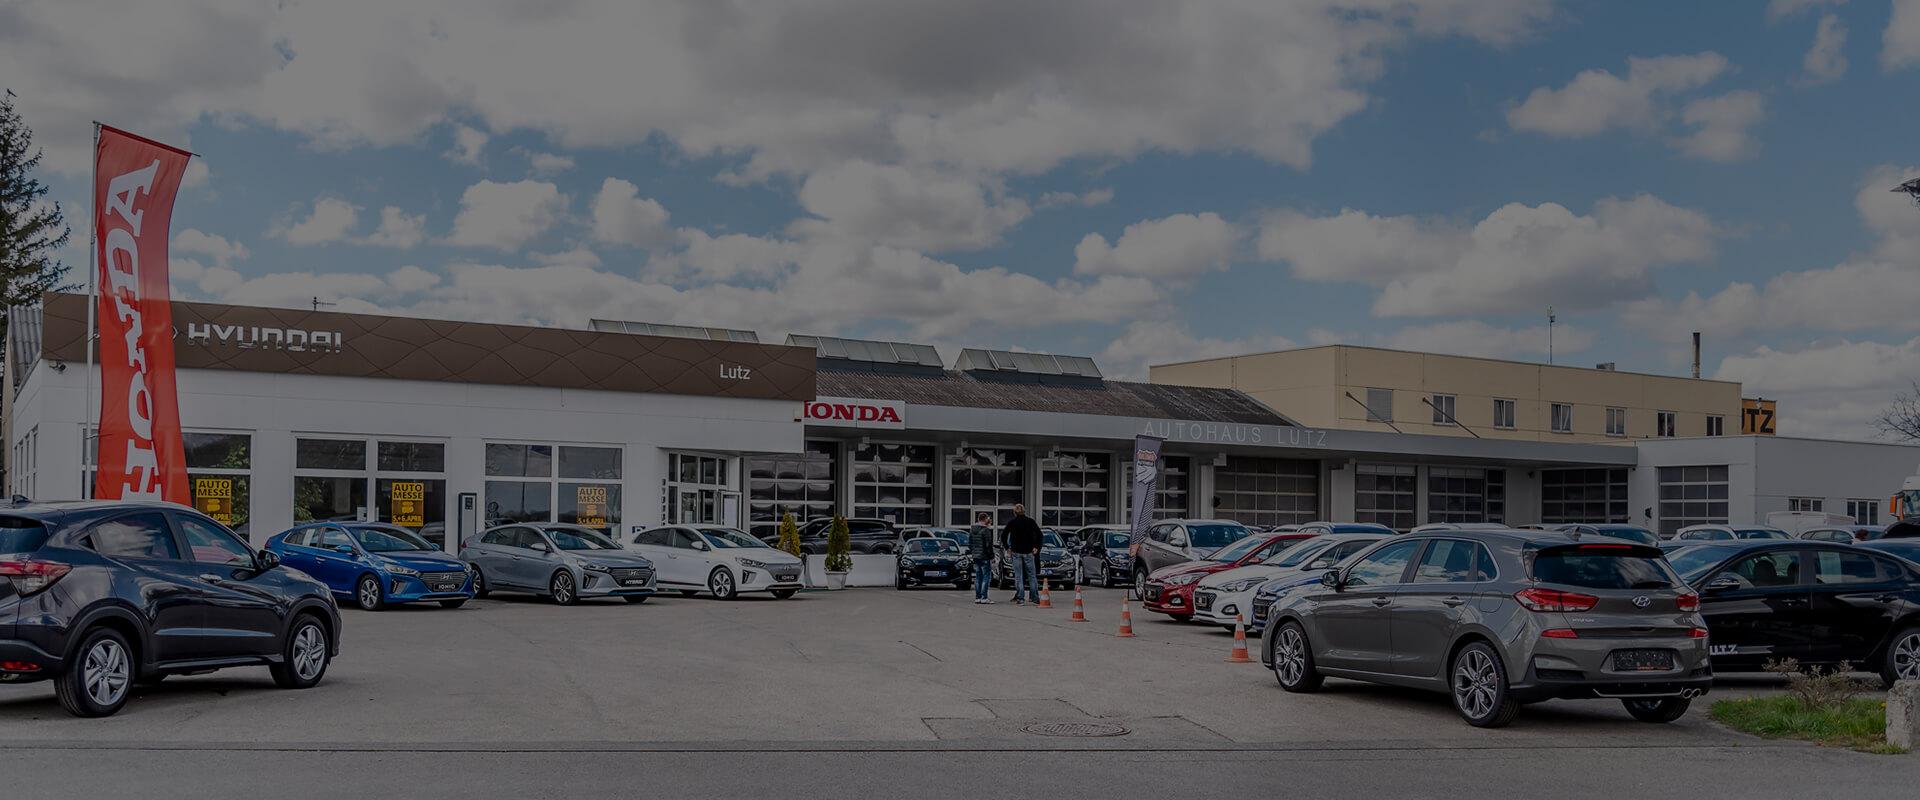 Autohaus Lutz